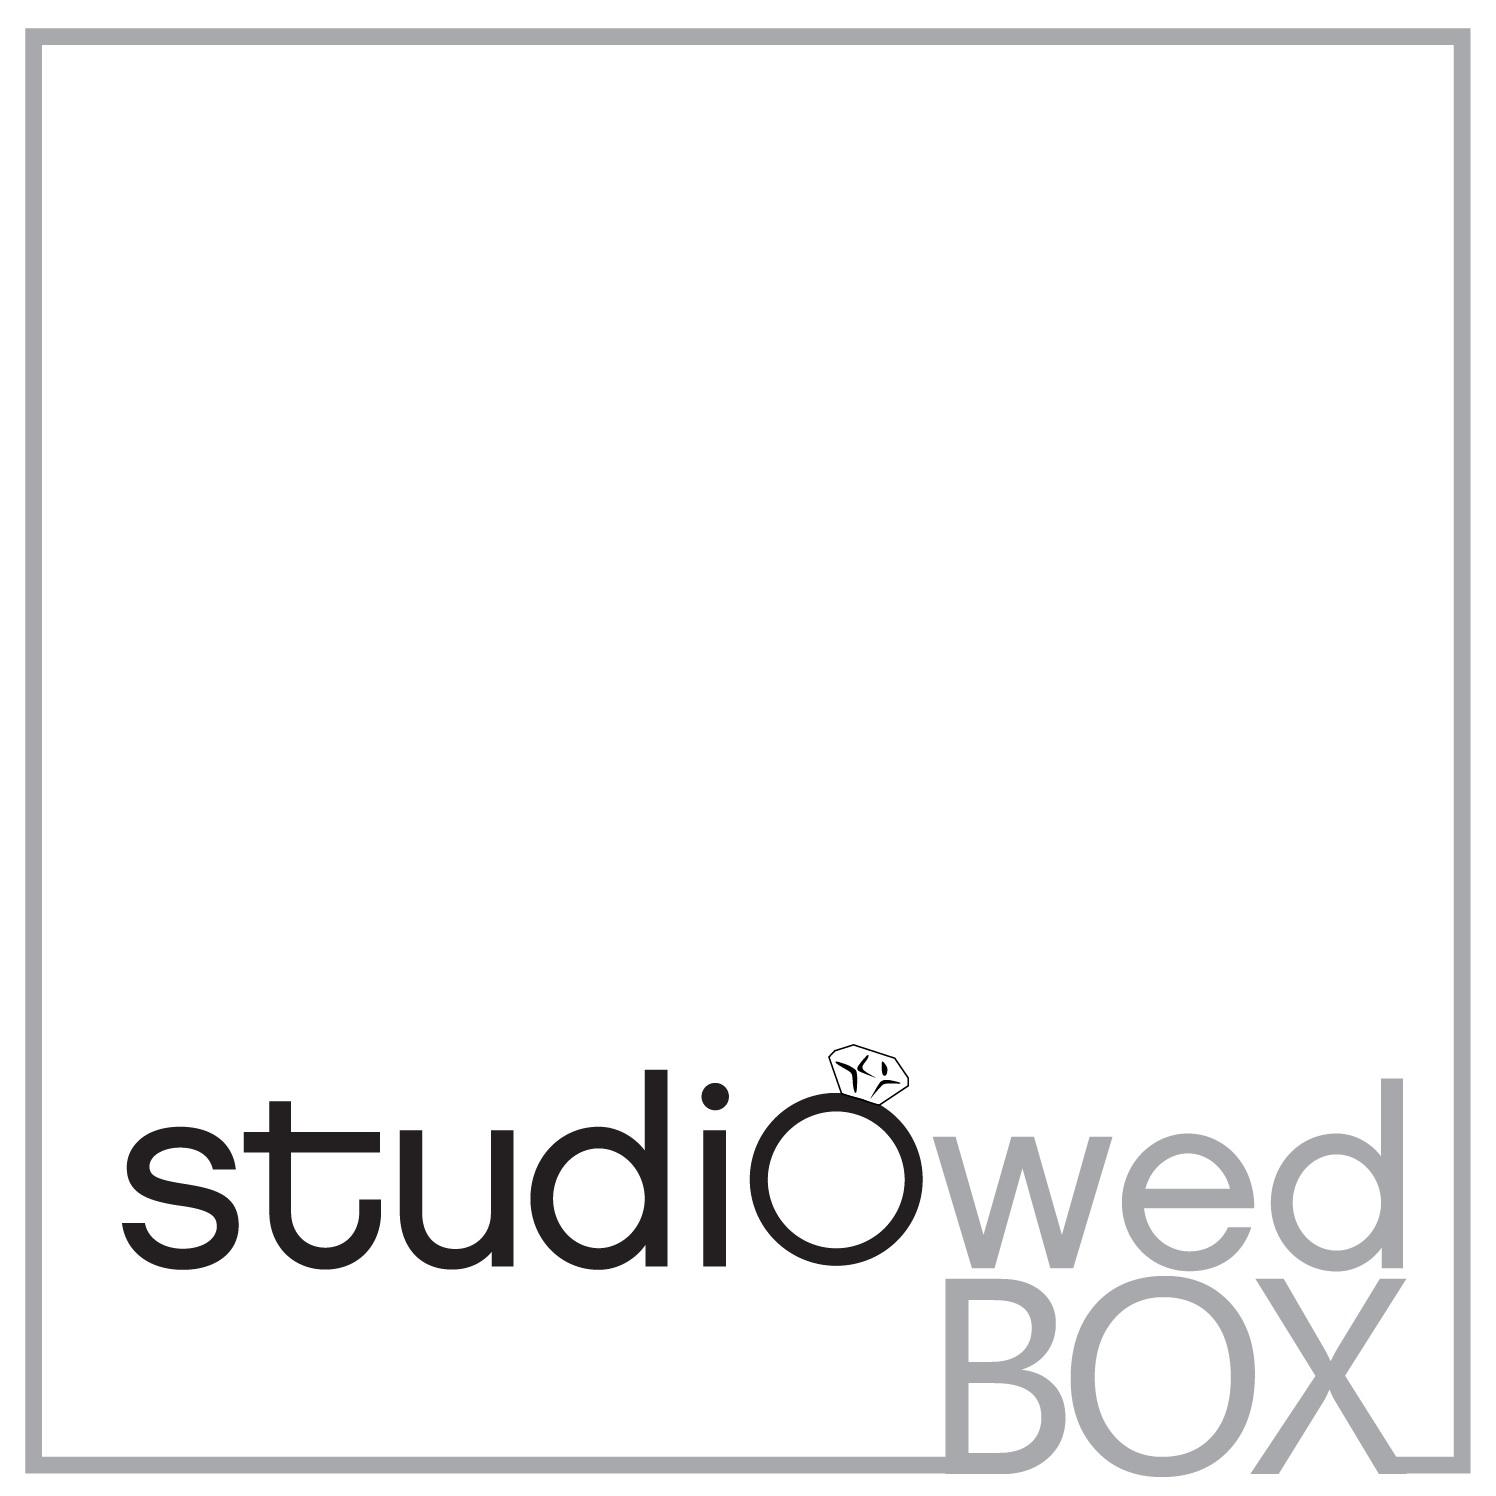 StudioWed Box